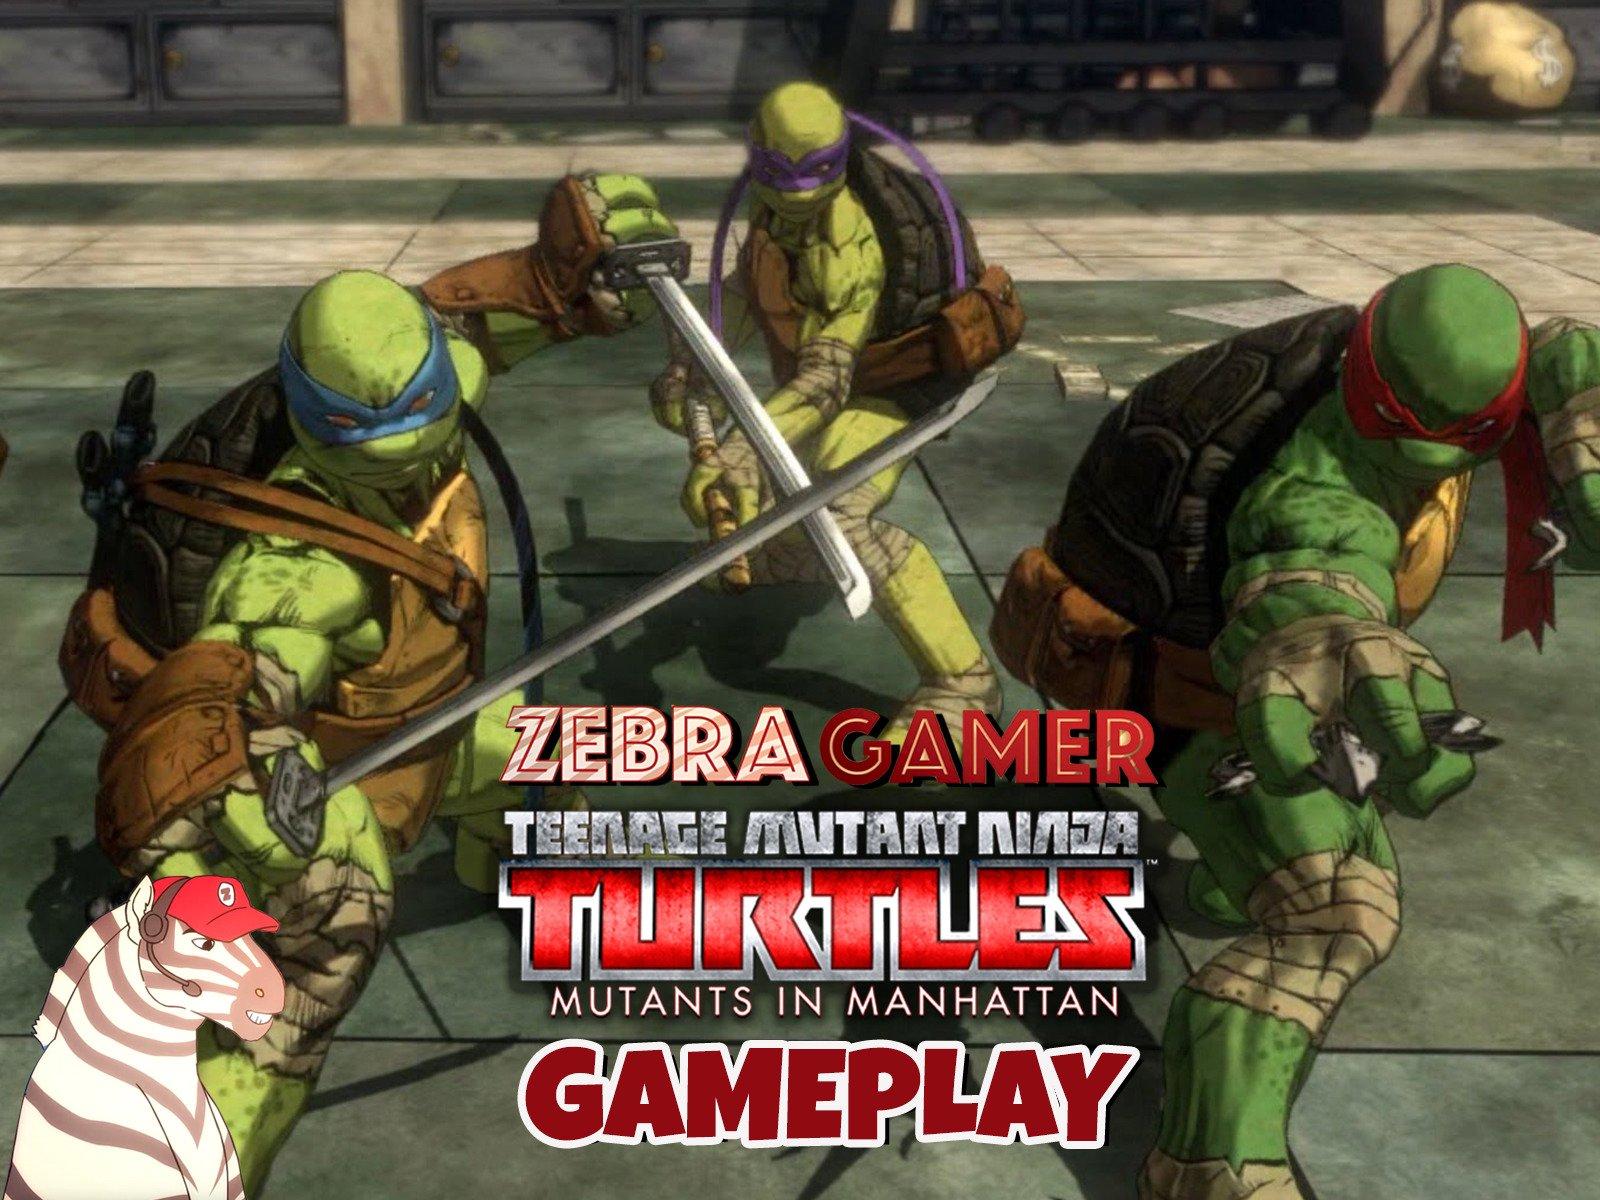 Clip: Teenage Mutant Ninja Turtles: Mutants in Manhattan Gameplay - Season 1